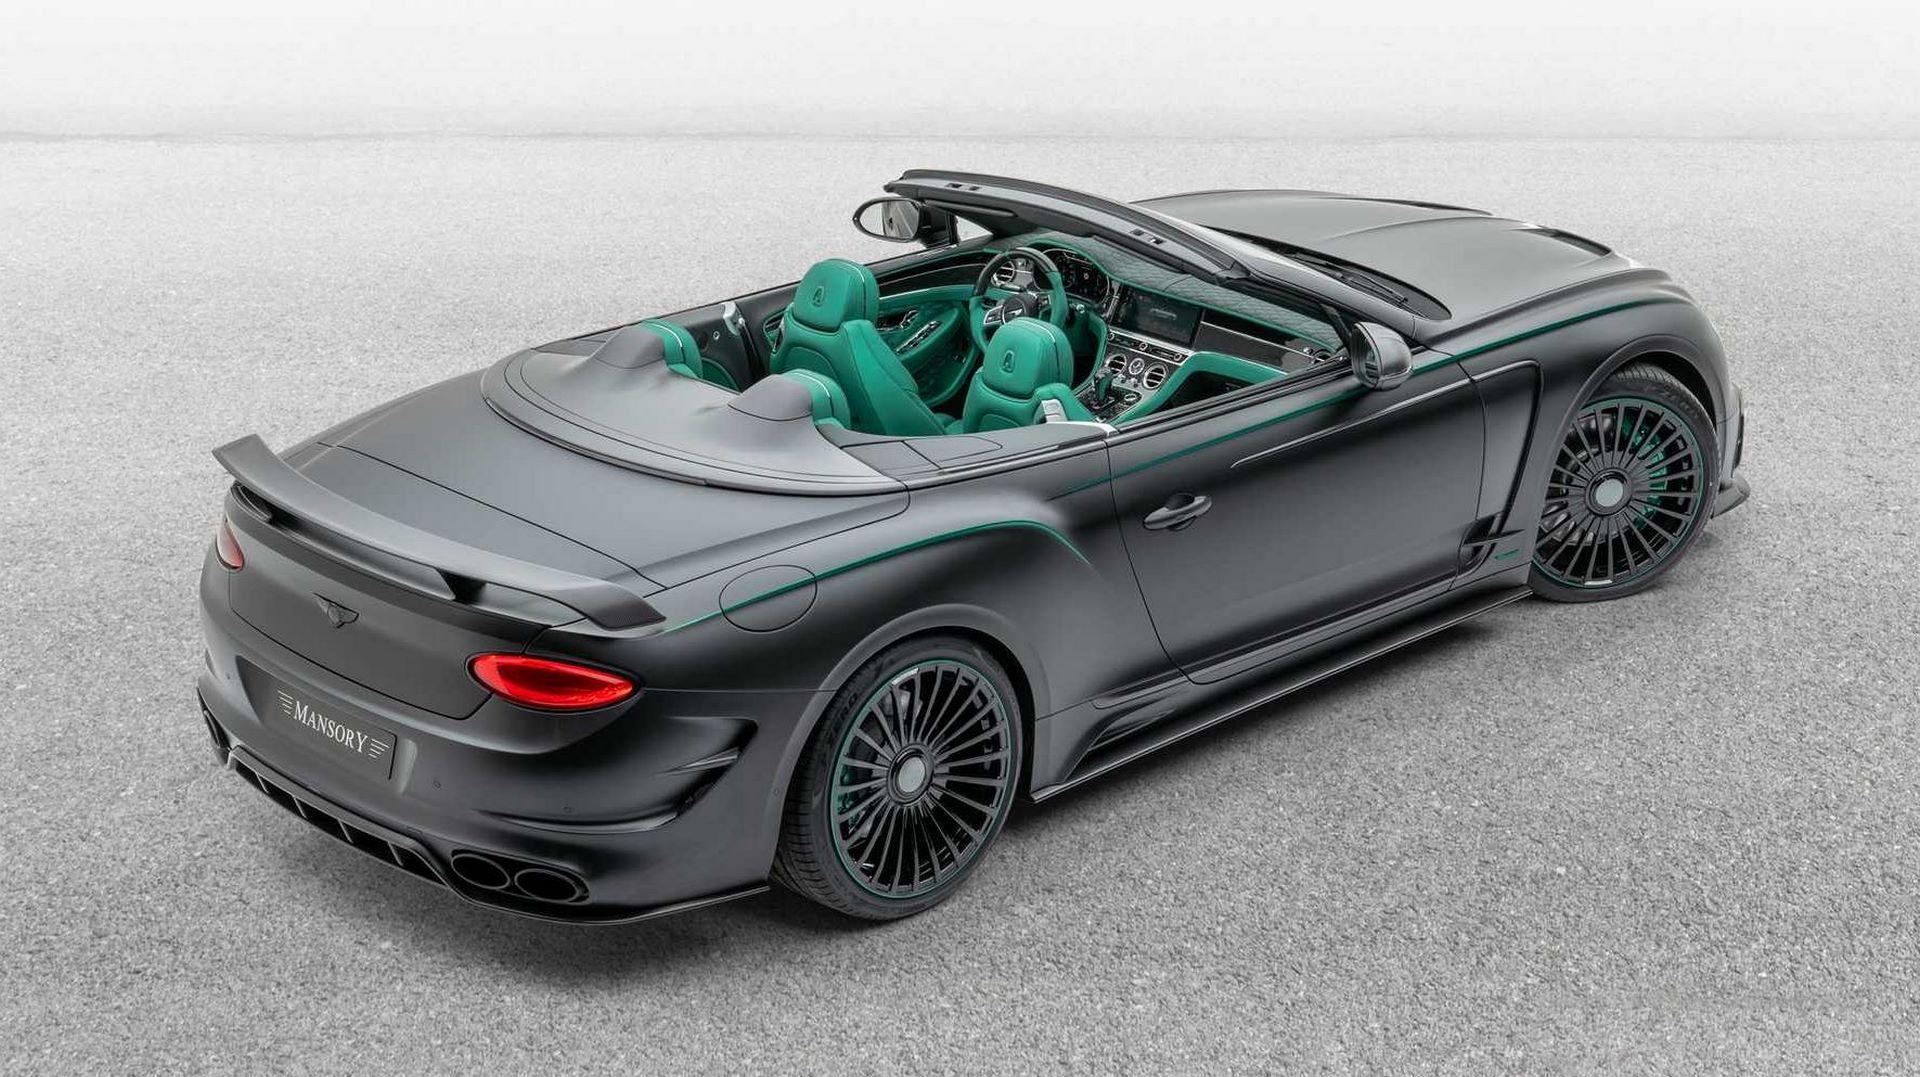 Bentley-Continental-GTC-V8-Cabriolet-Mansory-7